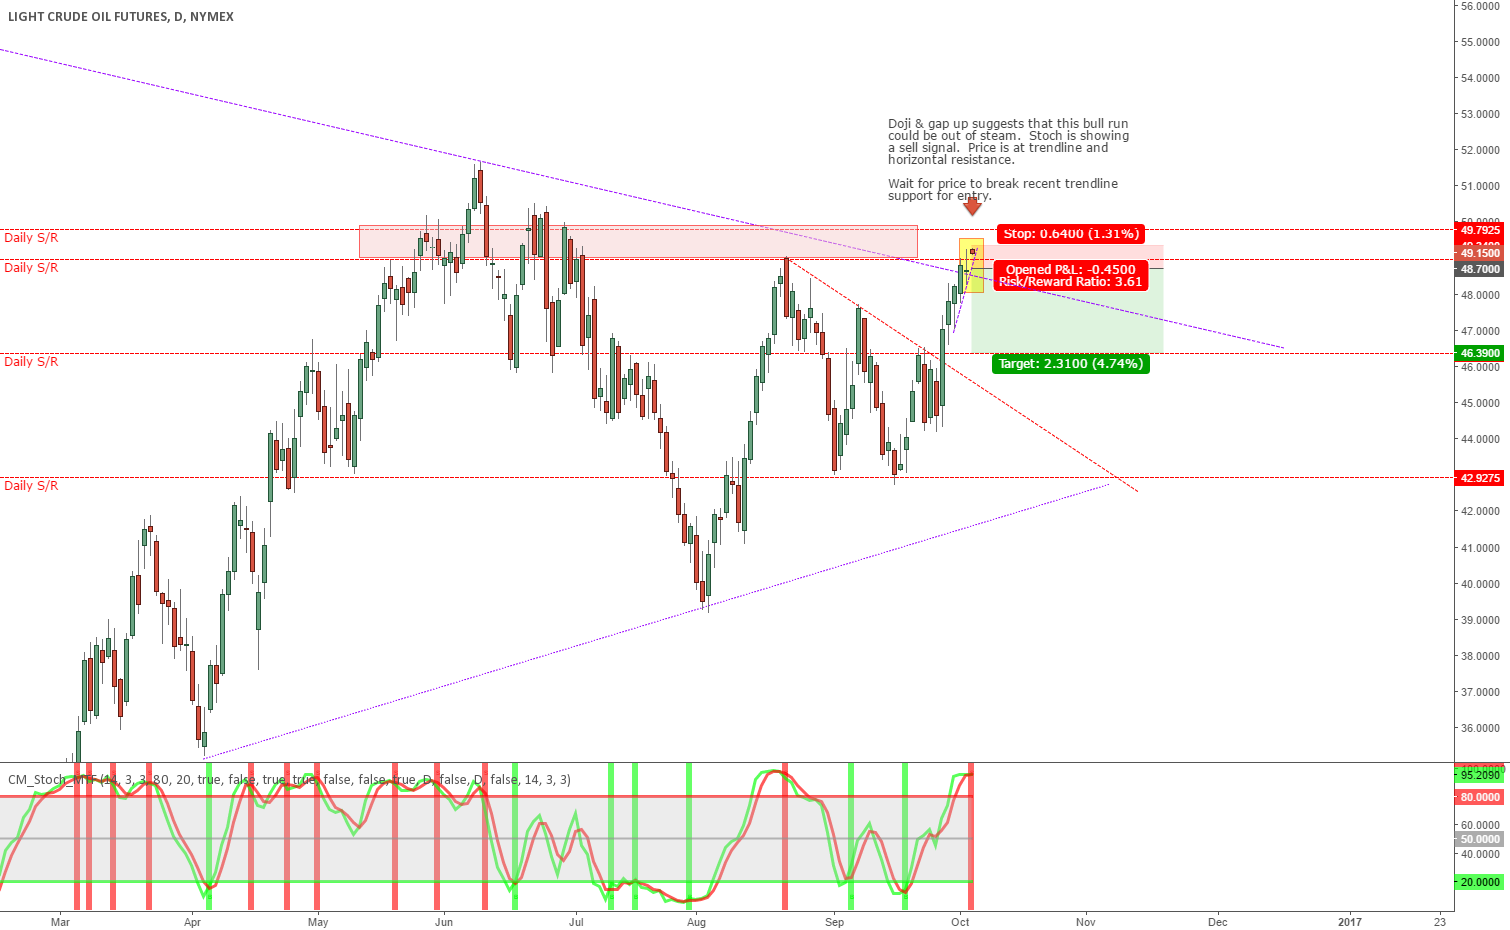 Crude - Looking bearish after recent gains (corrected)